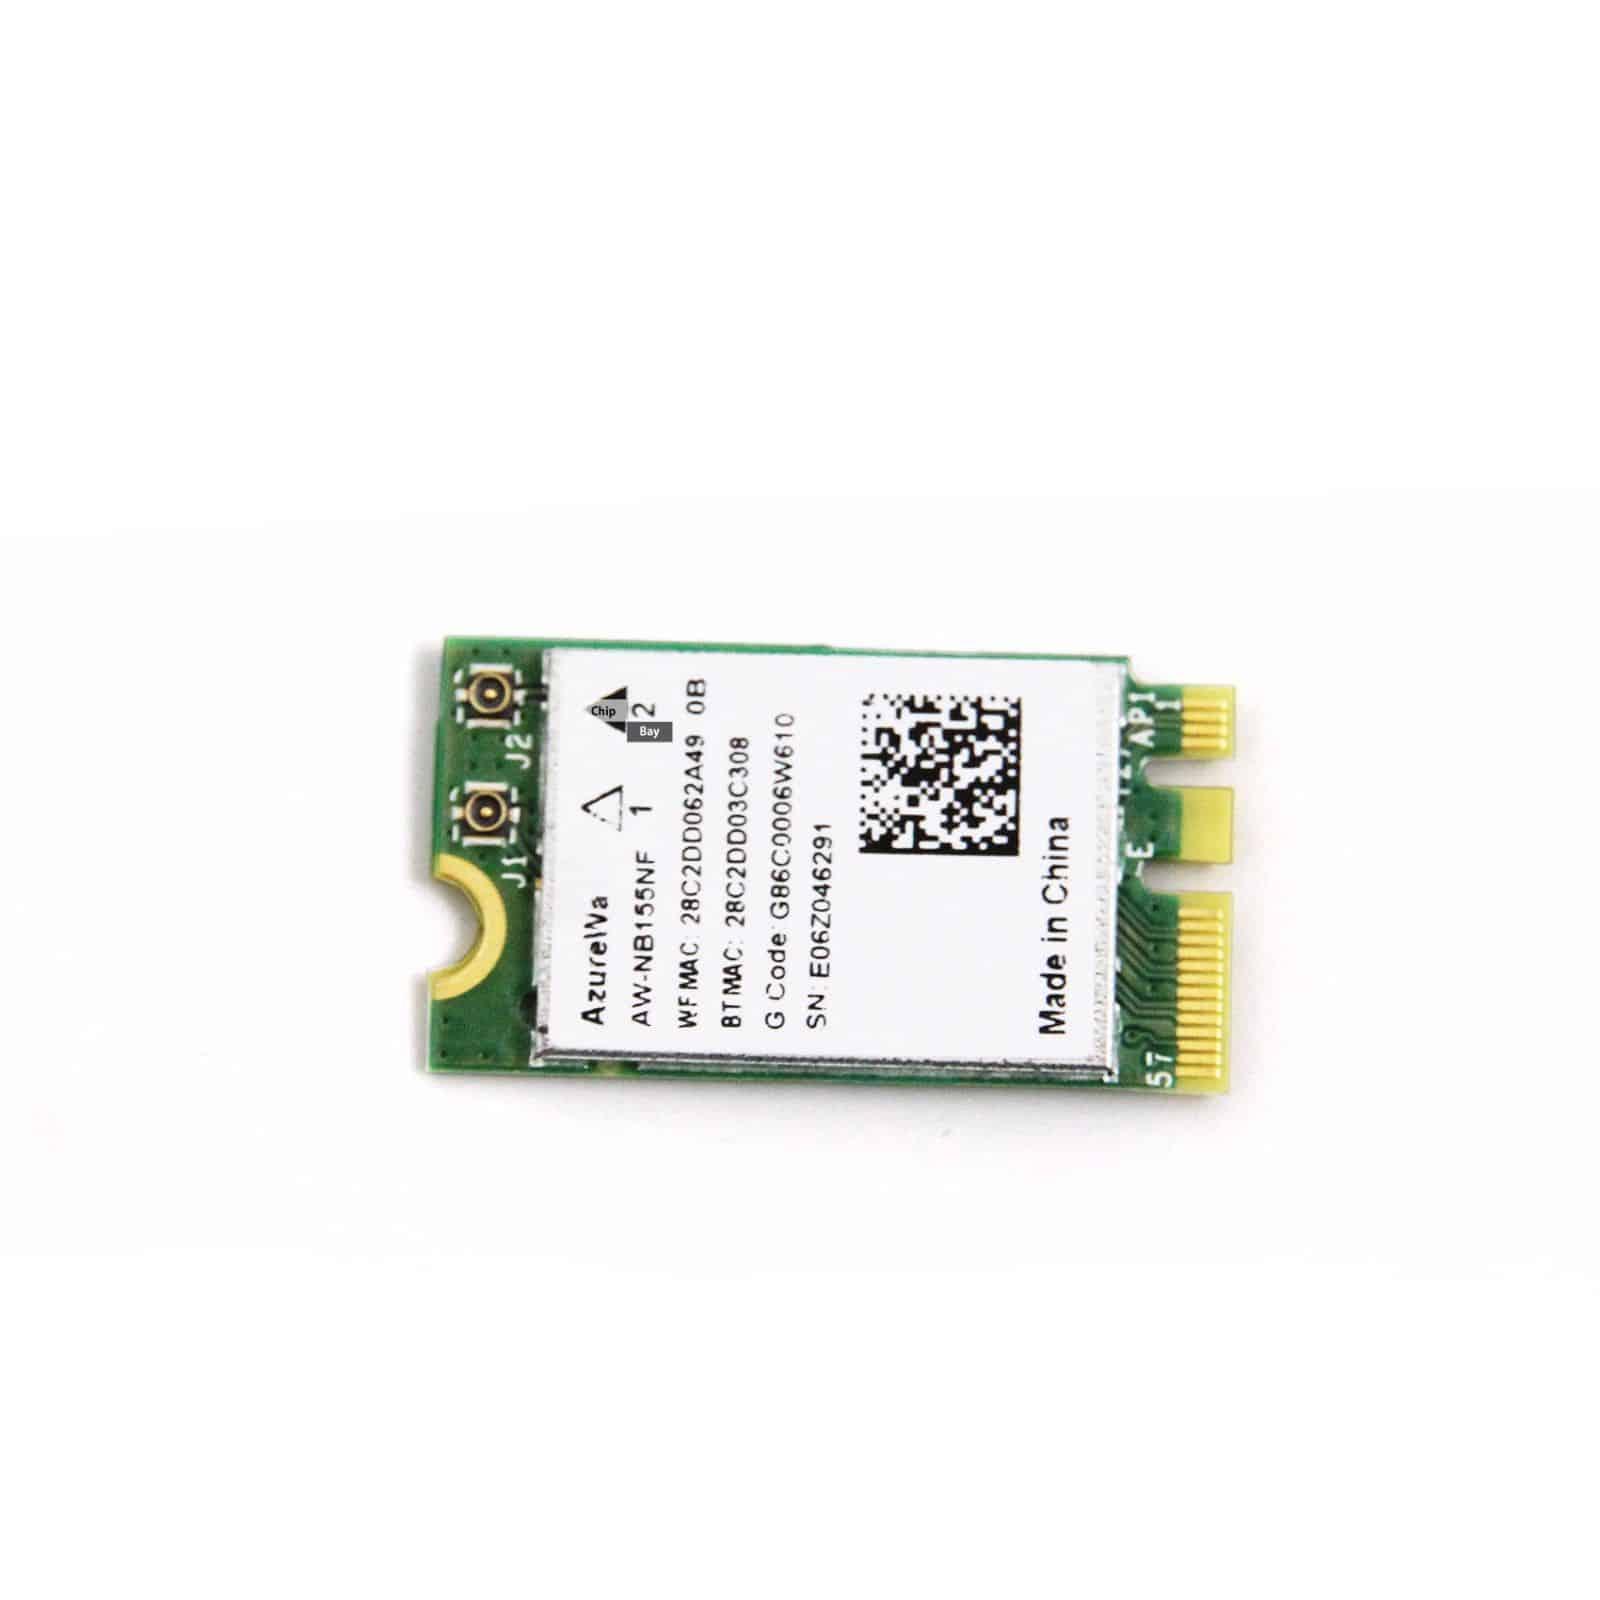 TESTED HP 501272-003 Anatel WN7600R-MV PCI-e Wireless Network WiFi Adapter Card